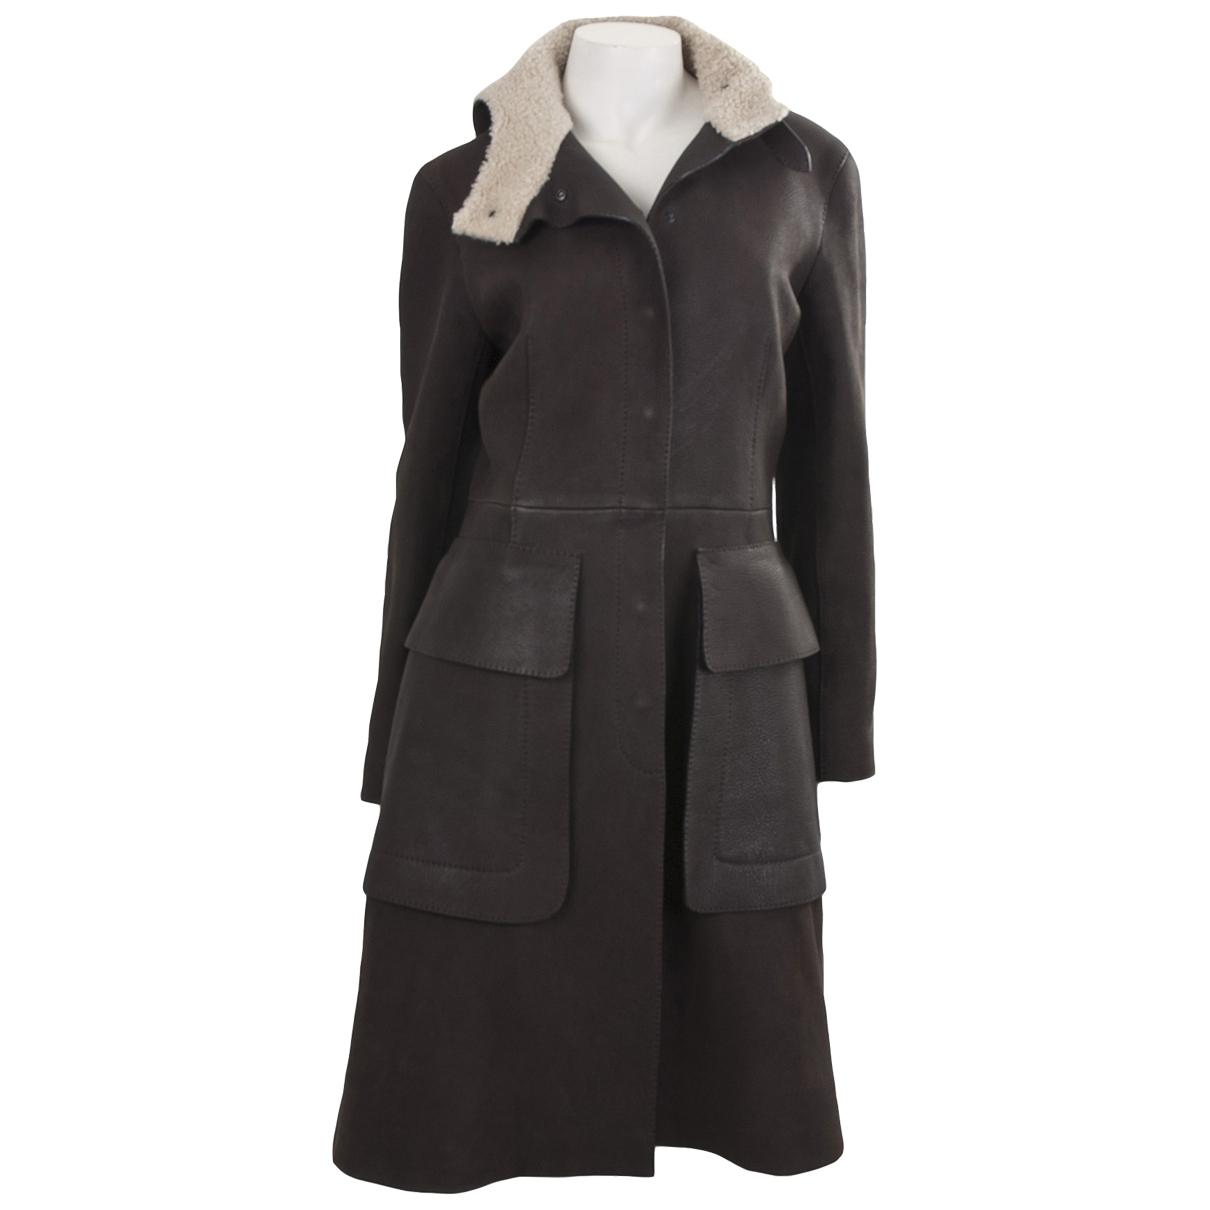 Hermès \N Brown Leather coat for Women 38 FR